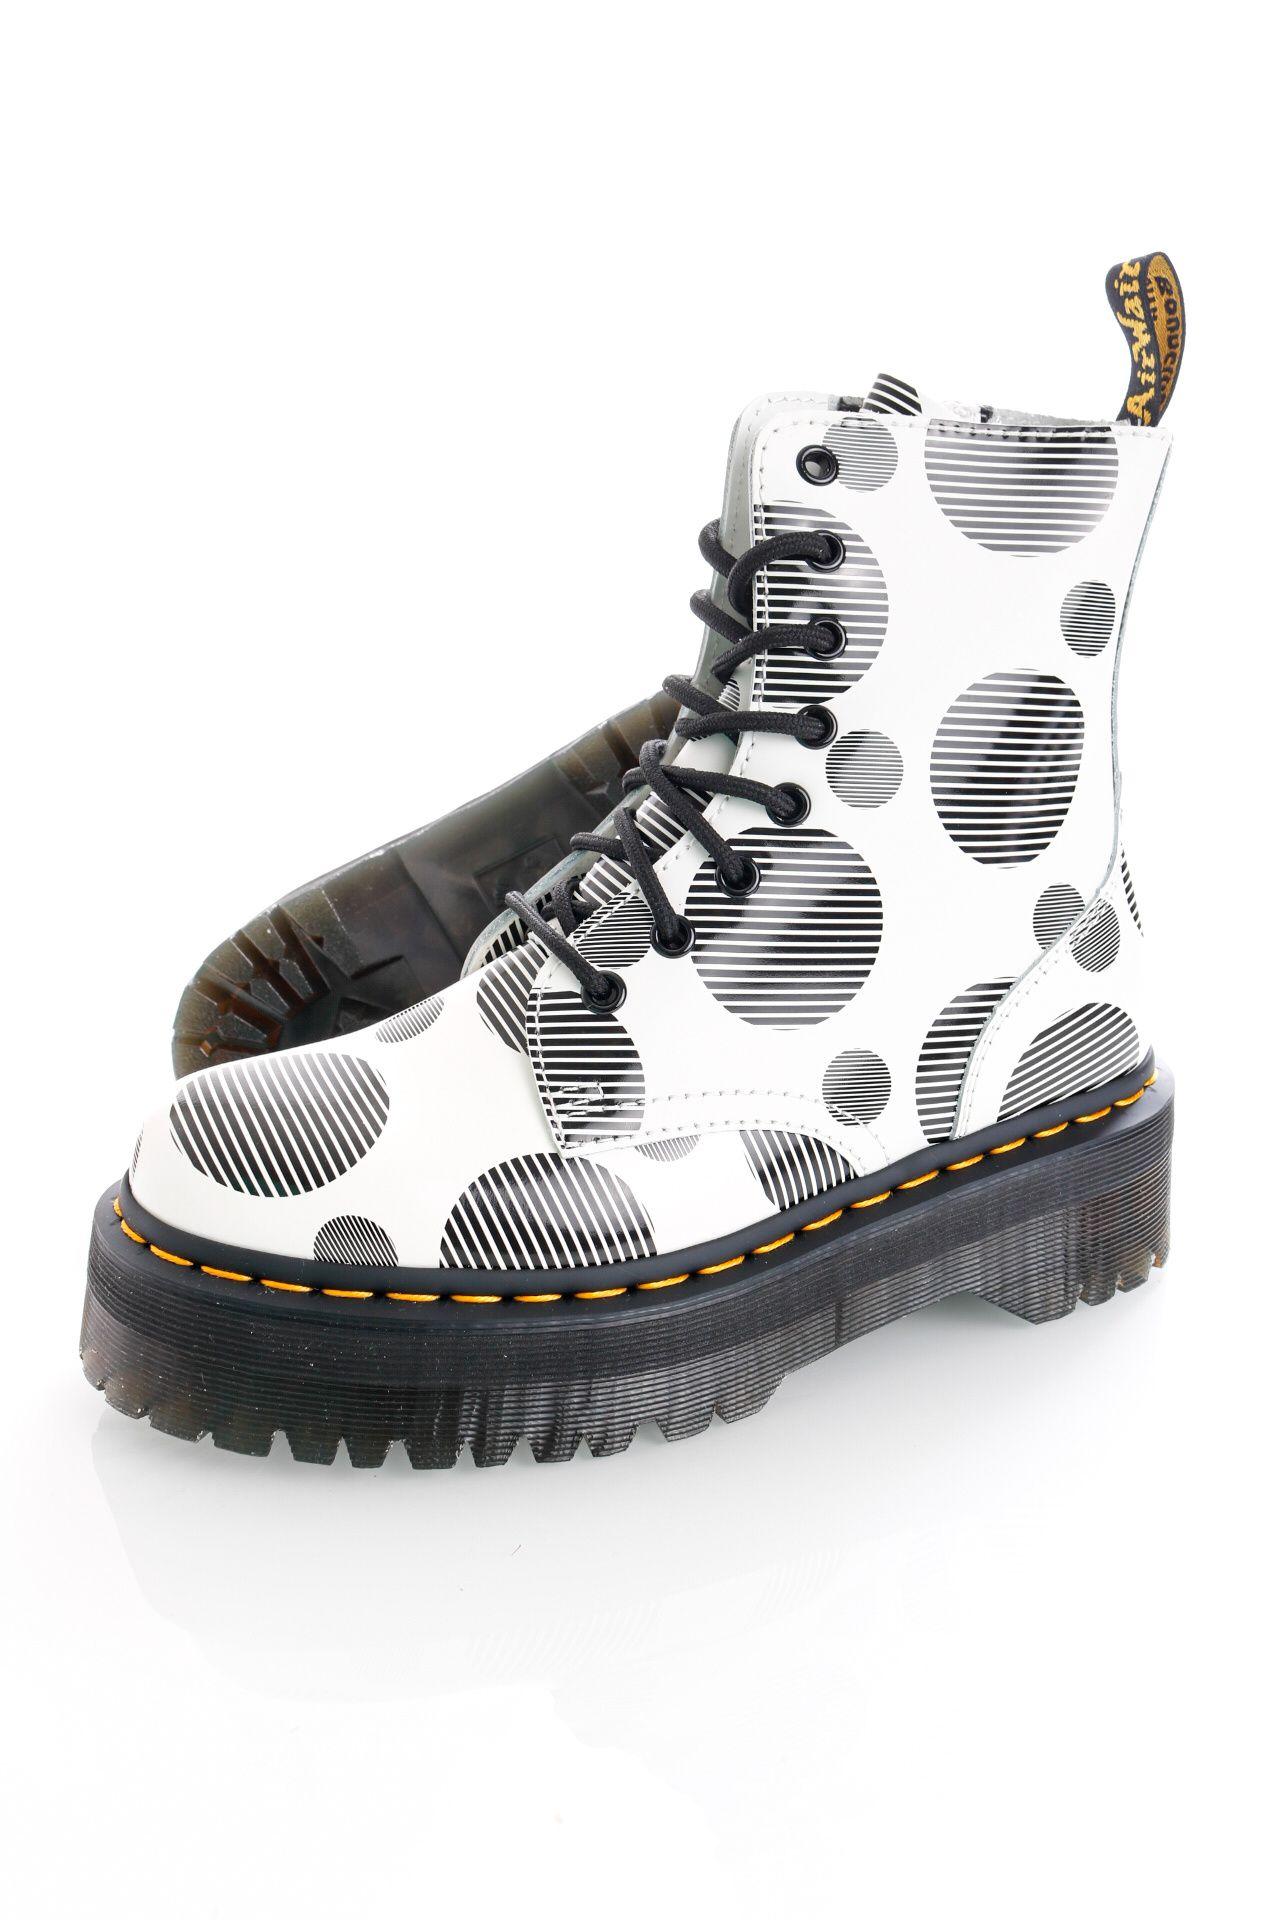 Afbeelding van Dr.Martens Boots Jadon White/Black Polka Dot Smooth 26882101